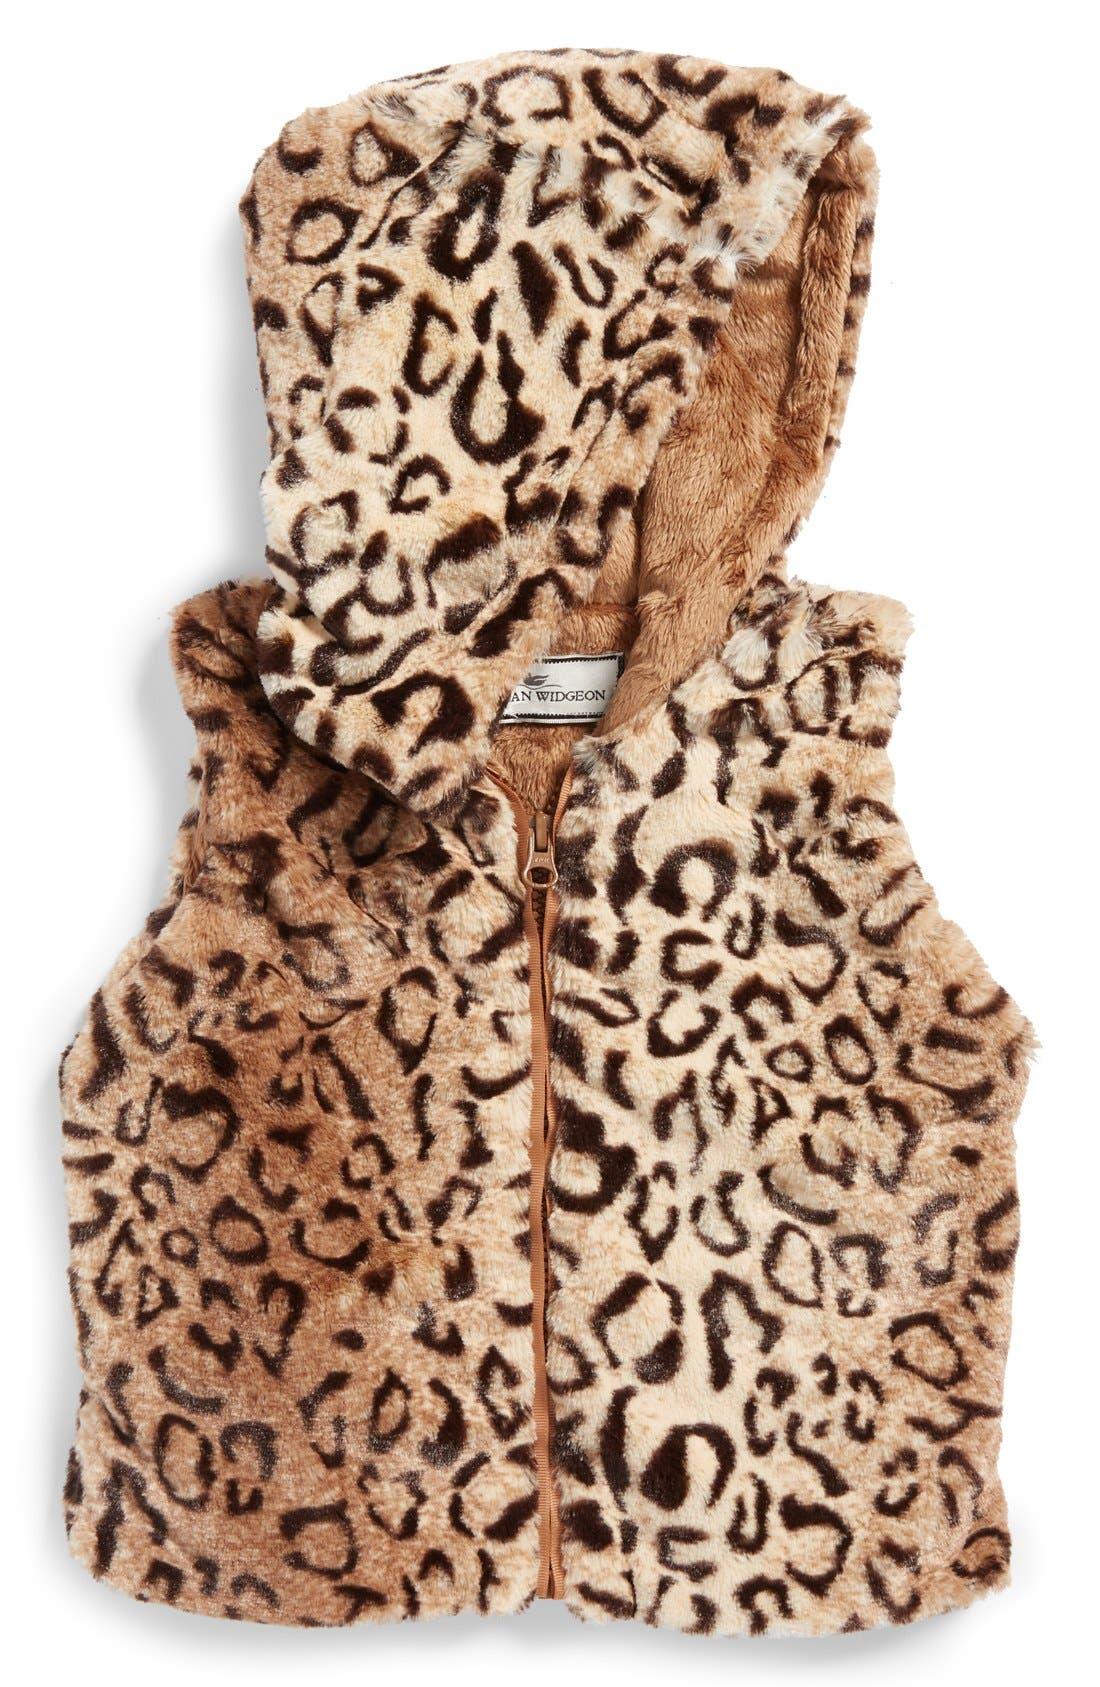 Alternate Image 1 Selected - Widgeon Hooded Faux Fur Vest (Toddler Girls, Little Girls & Big Girls) (Online Only)